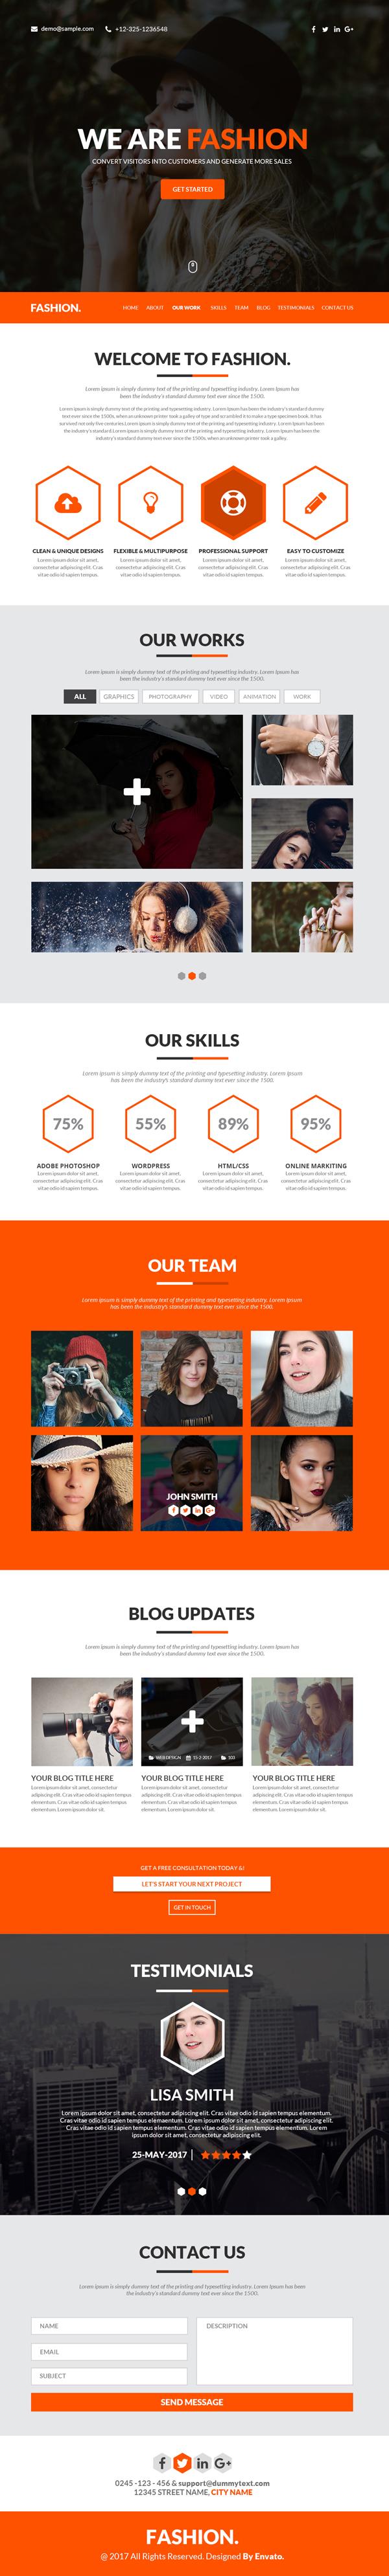 Fashion One Page Portfolio Template